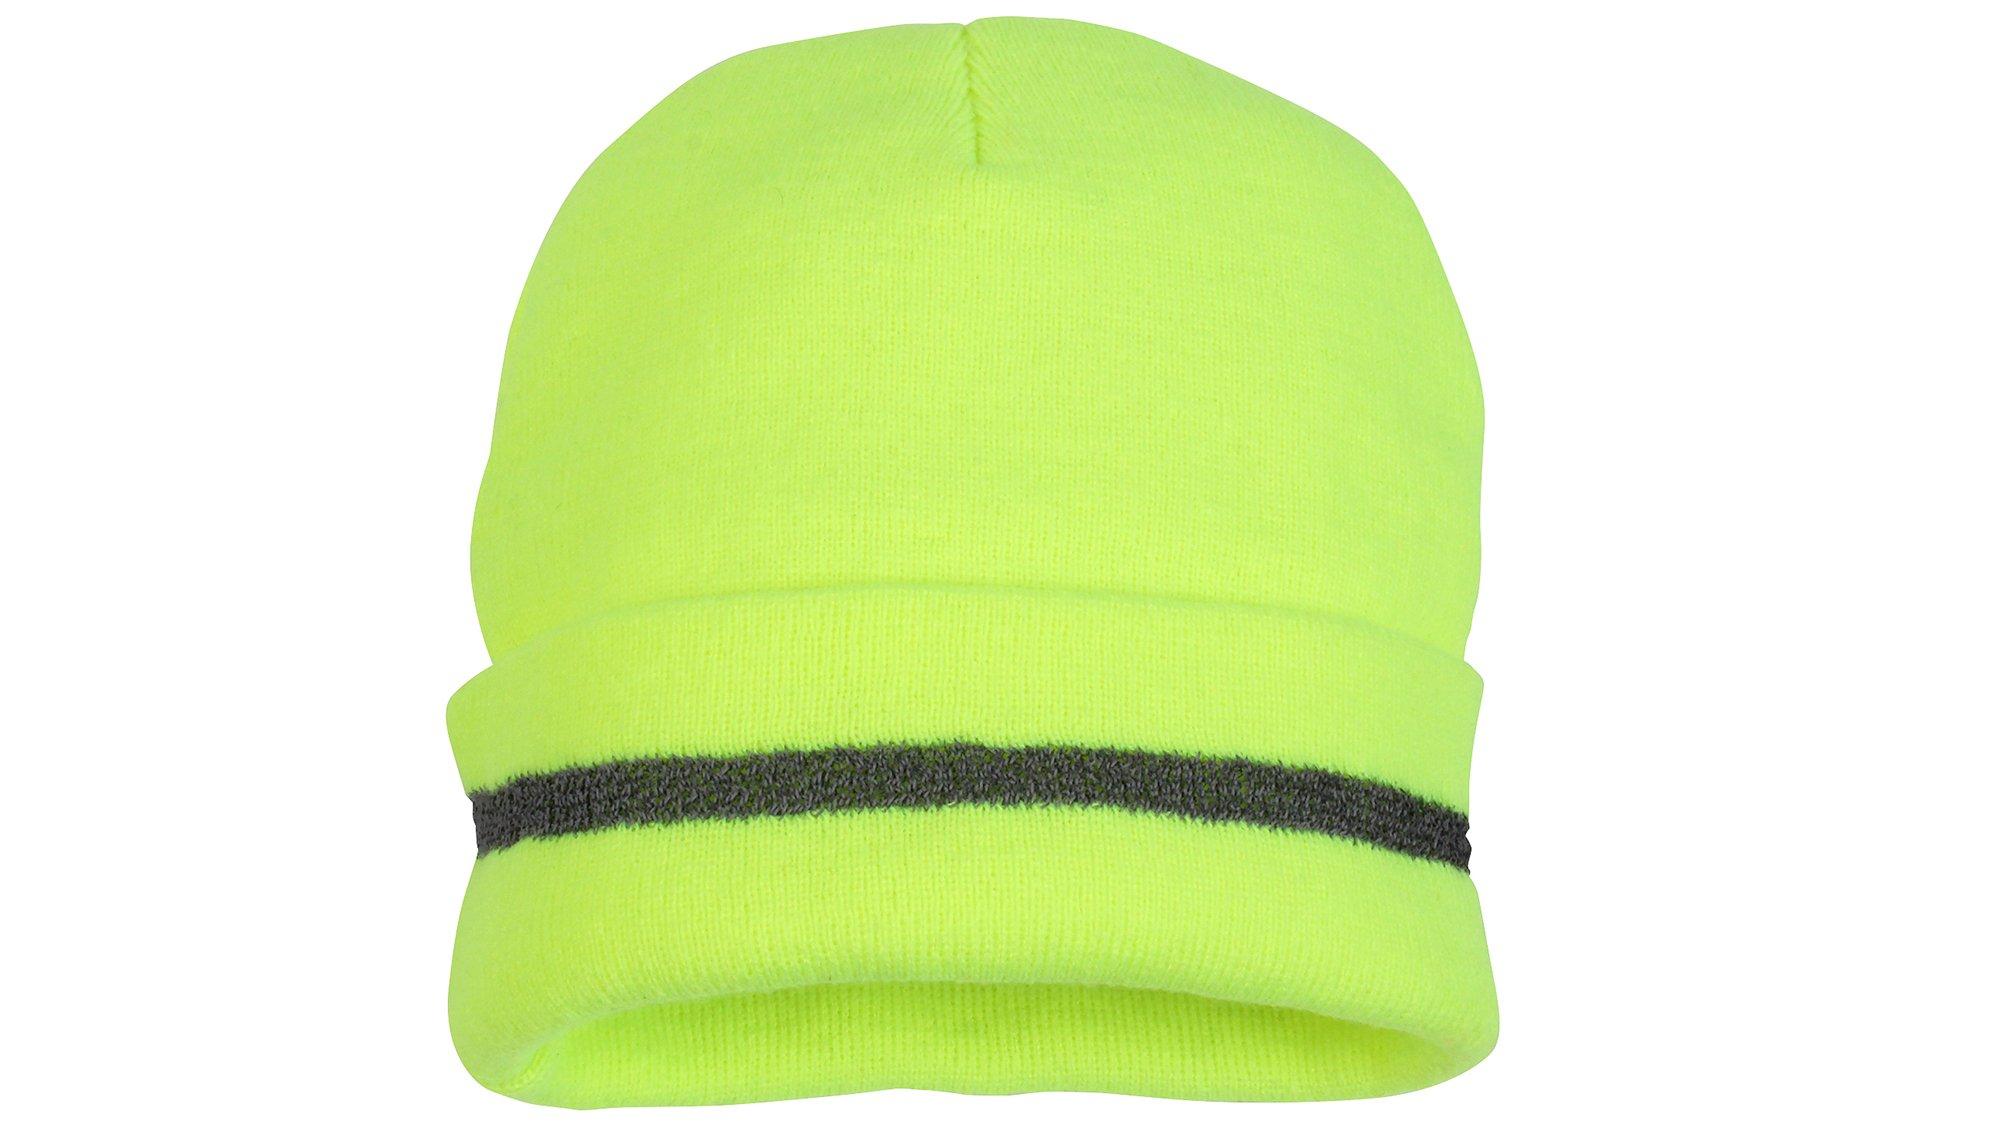 Pyramex RH110 Hi-Vis Reflective Lime Knit Cap, (12 Each) by Pyramex Safety